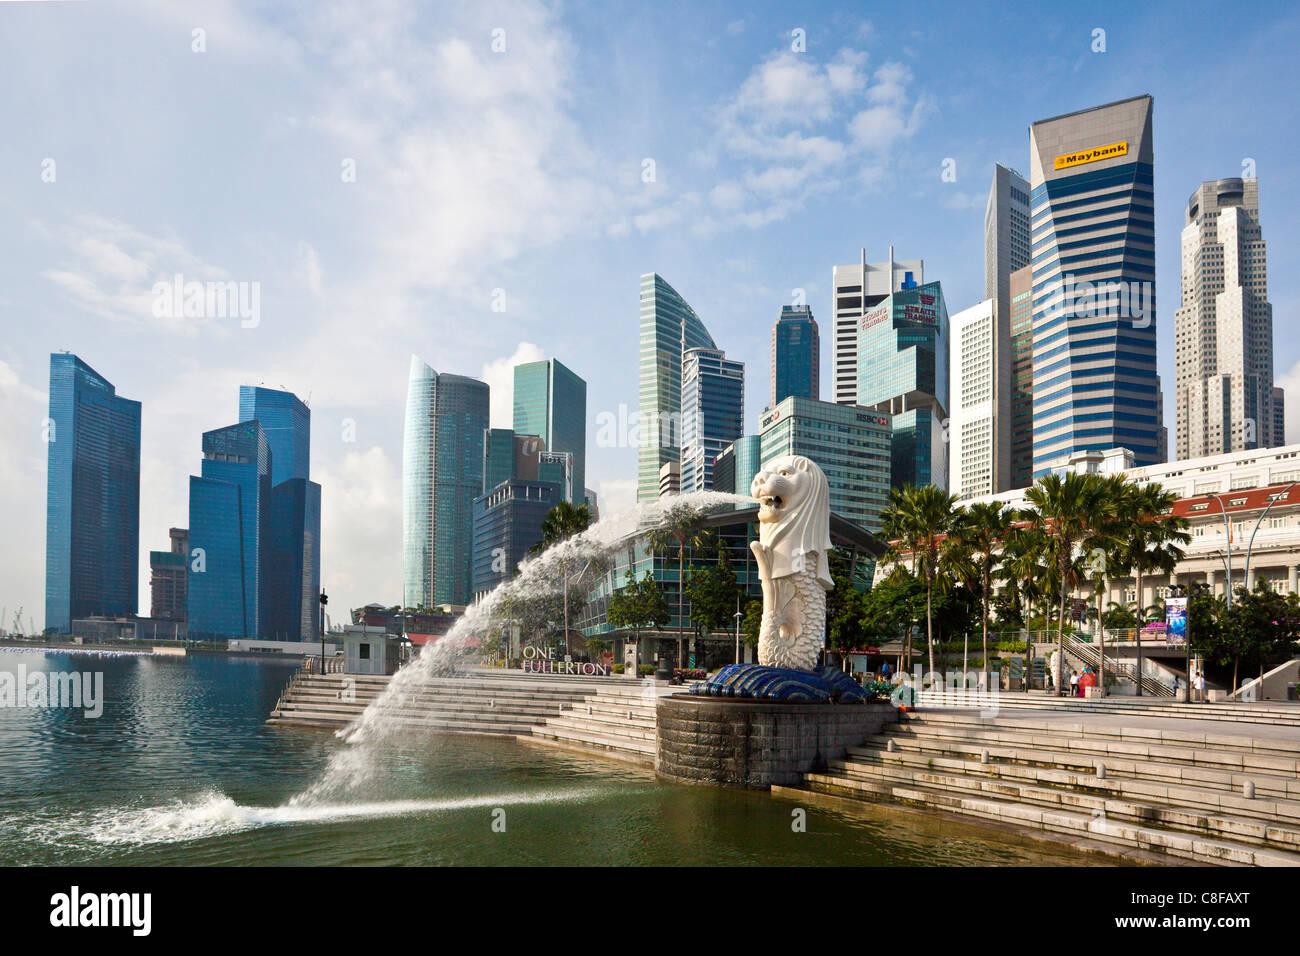 Singapur, Asia, Merlion, Landmark, león, sirena, escultura, agua vomitar, escupir, banco promenade, escalera, Imagen De Stock